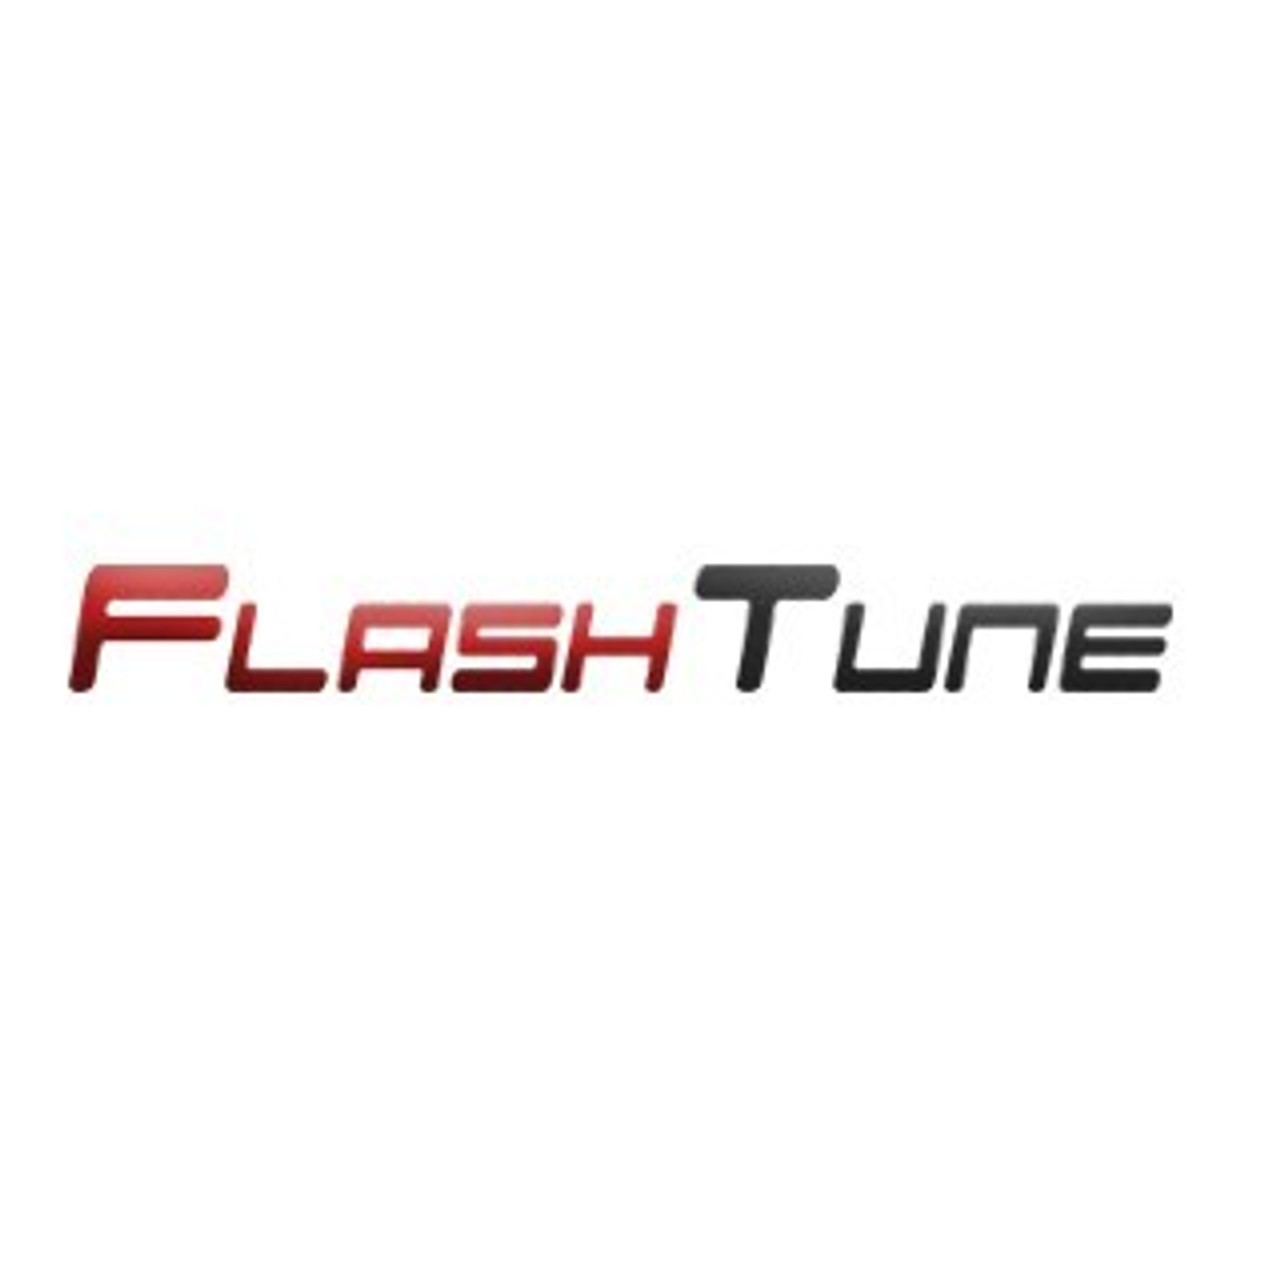 Flash Tune